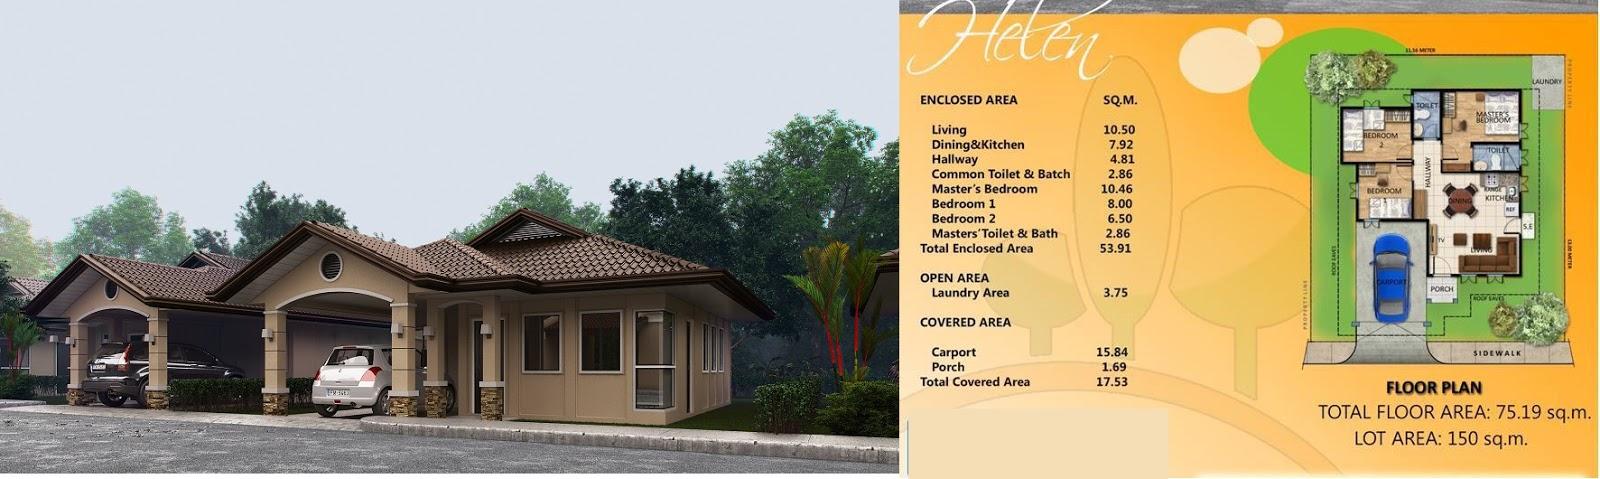 Villa Conchita Helen House Floor Plan